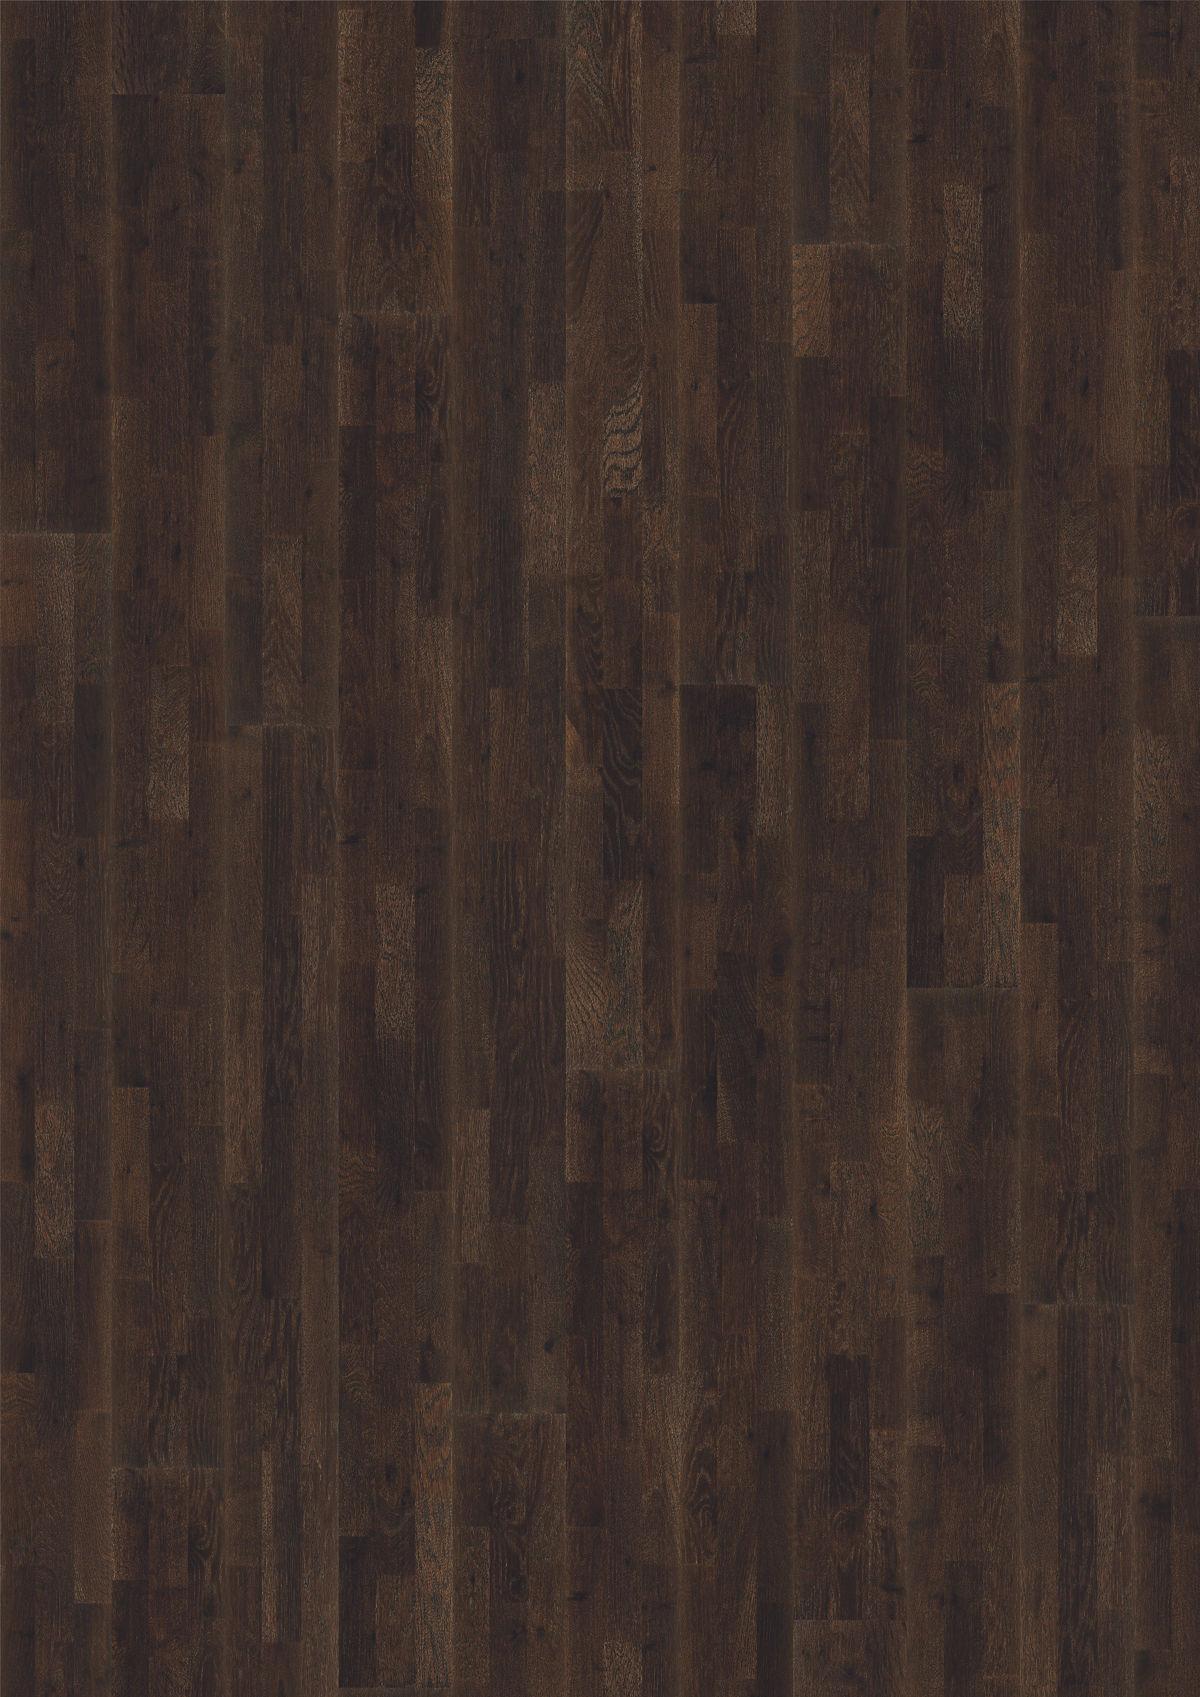 Kahrs oak lava engineered wood flooring for Lava parquet